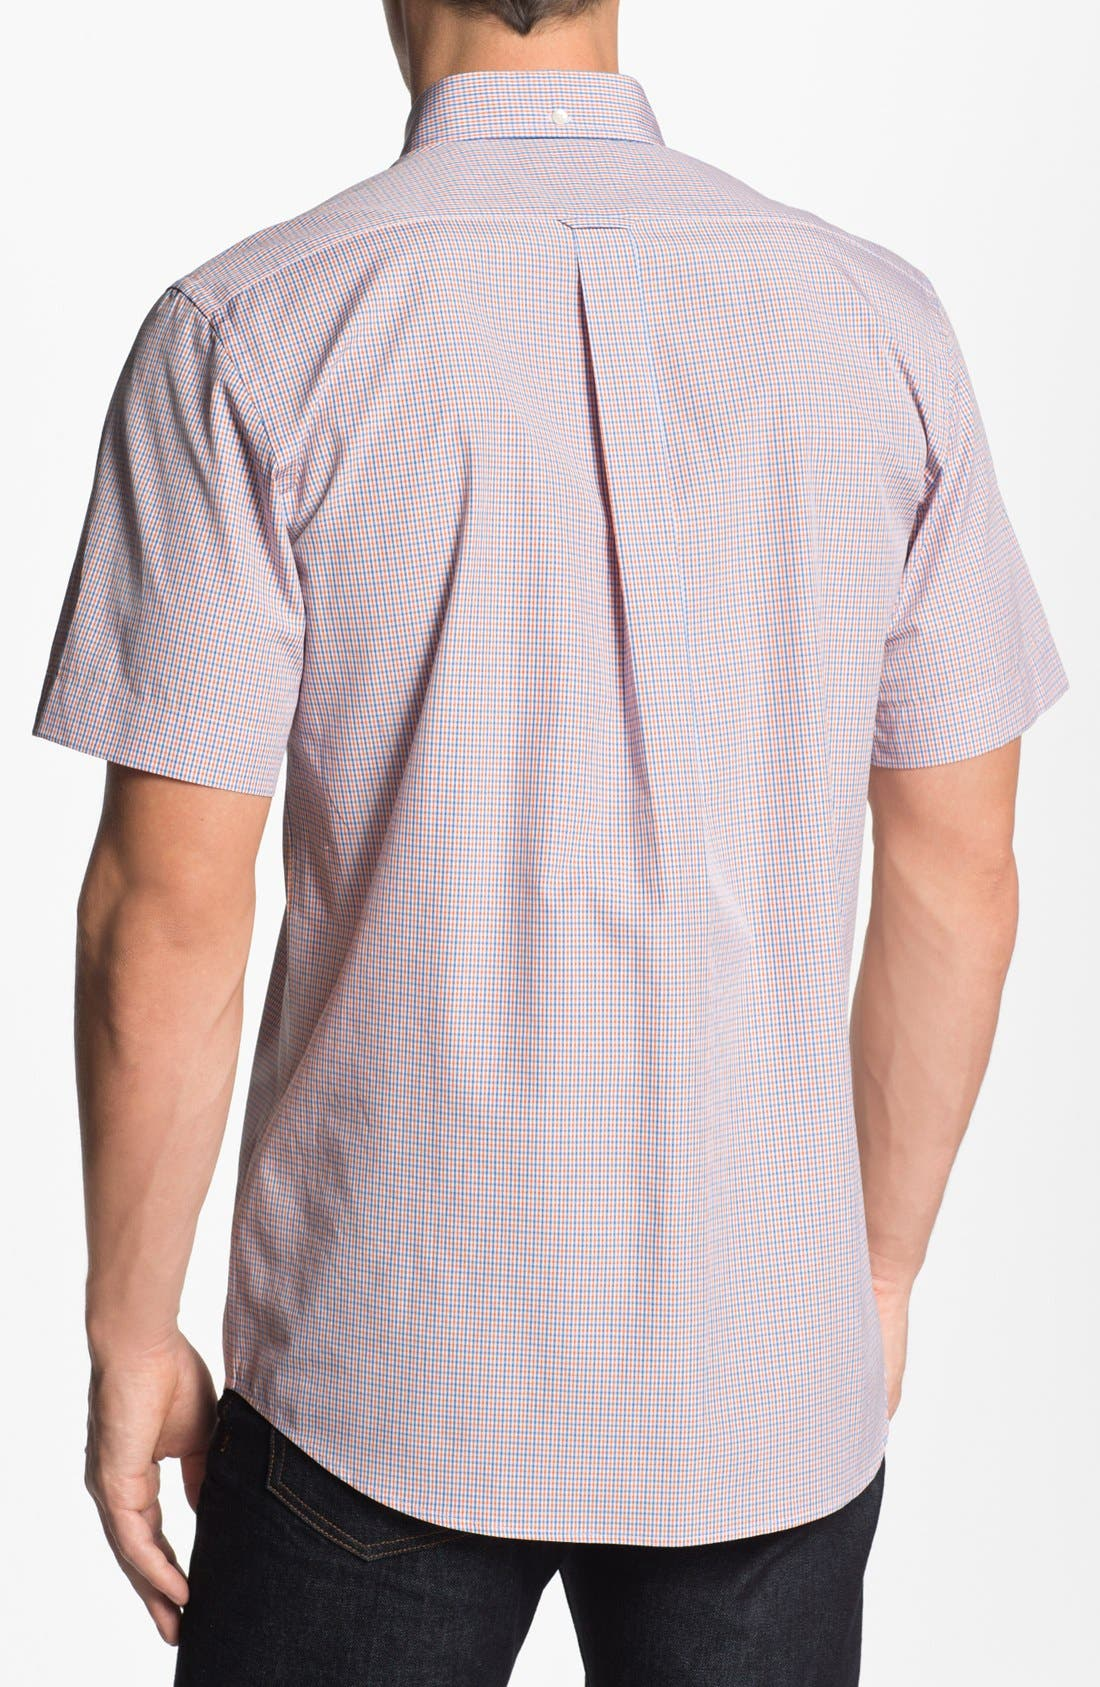 Alternate Image 2  - Façonnable Club Fit Short Sleeve Sport Shirt